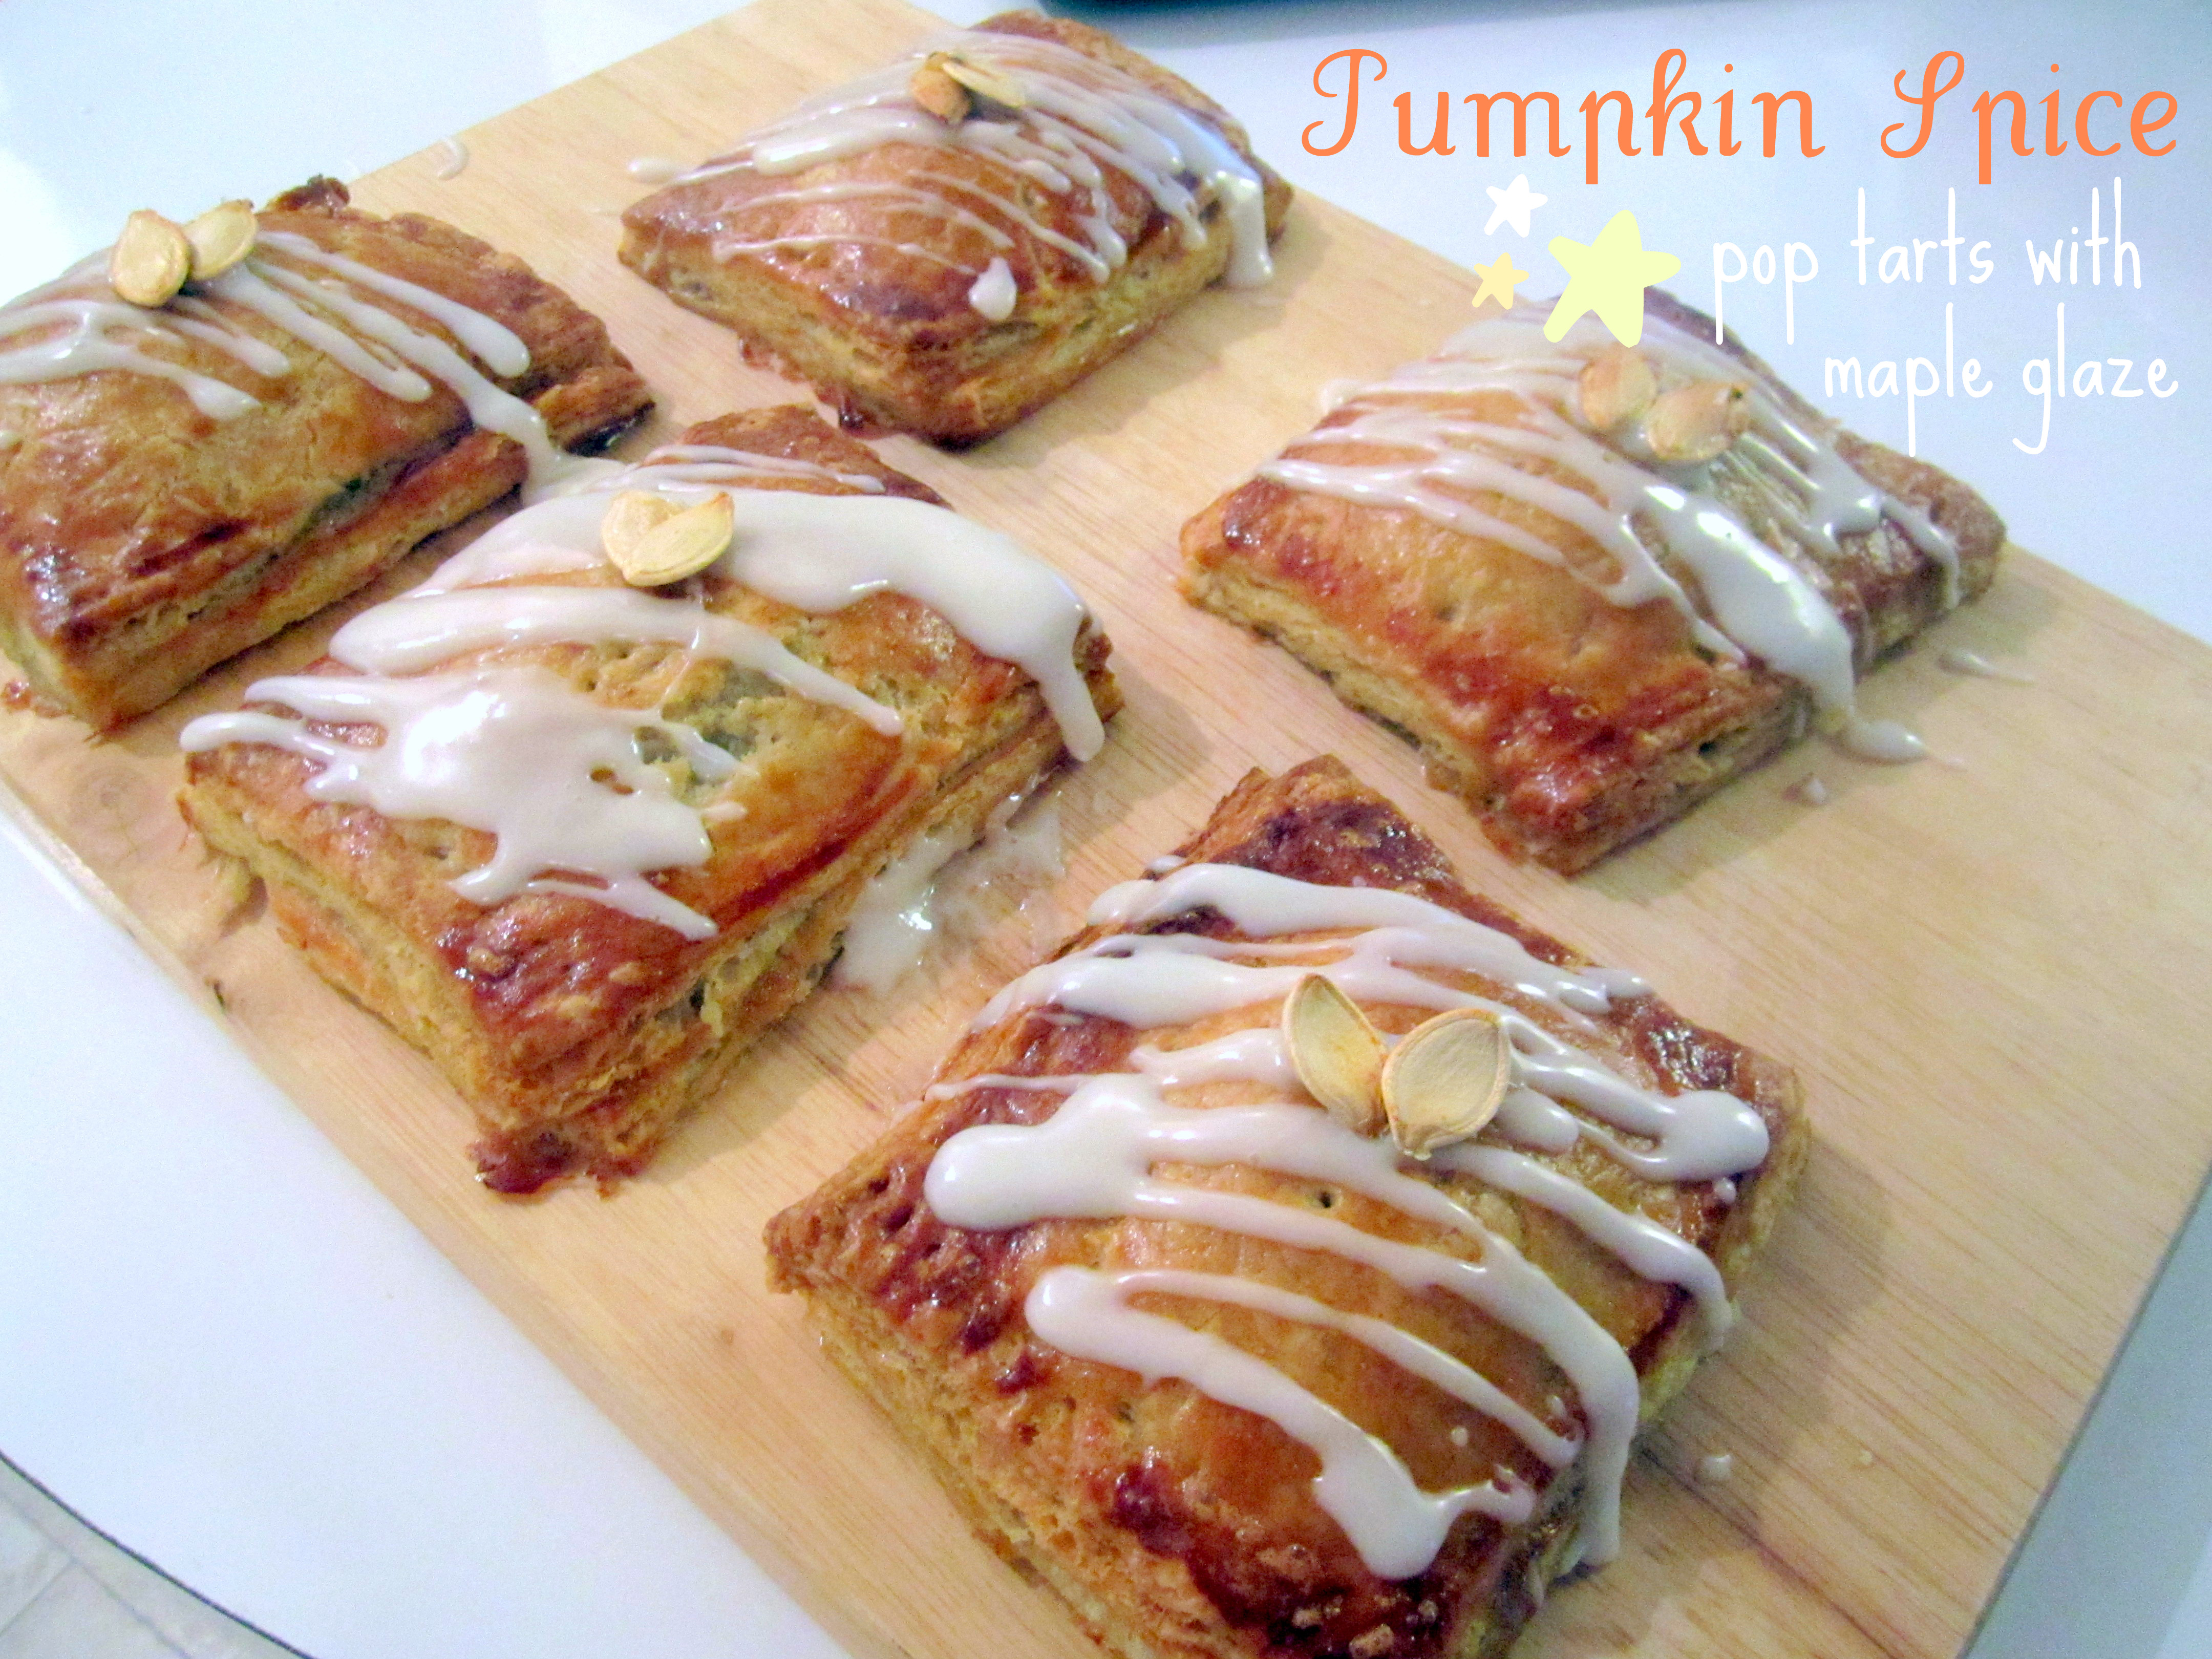 Pumpkin Spice Pop Tarts with Maple Glaze